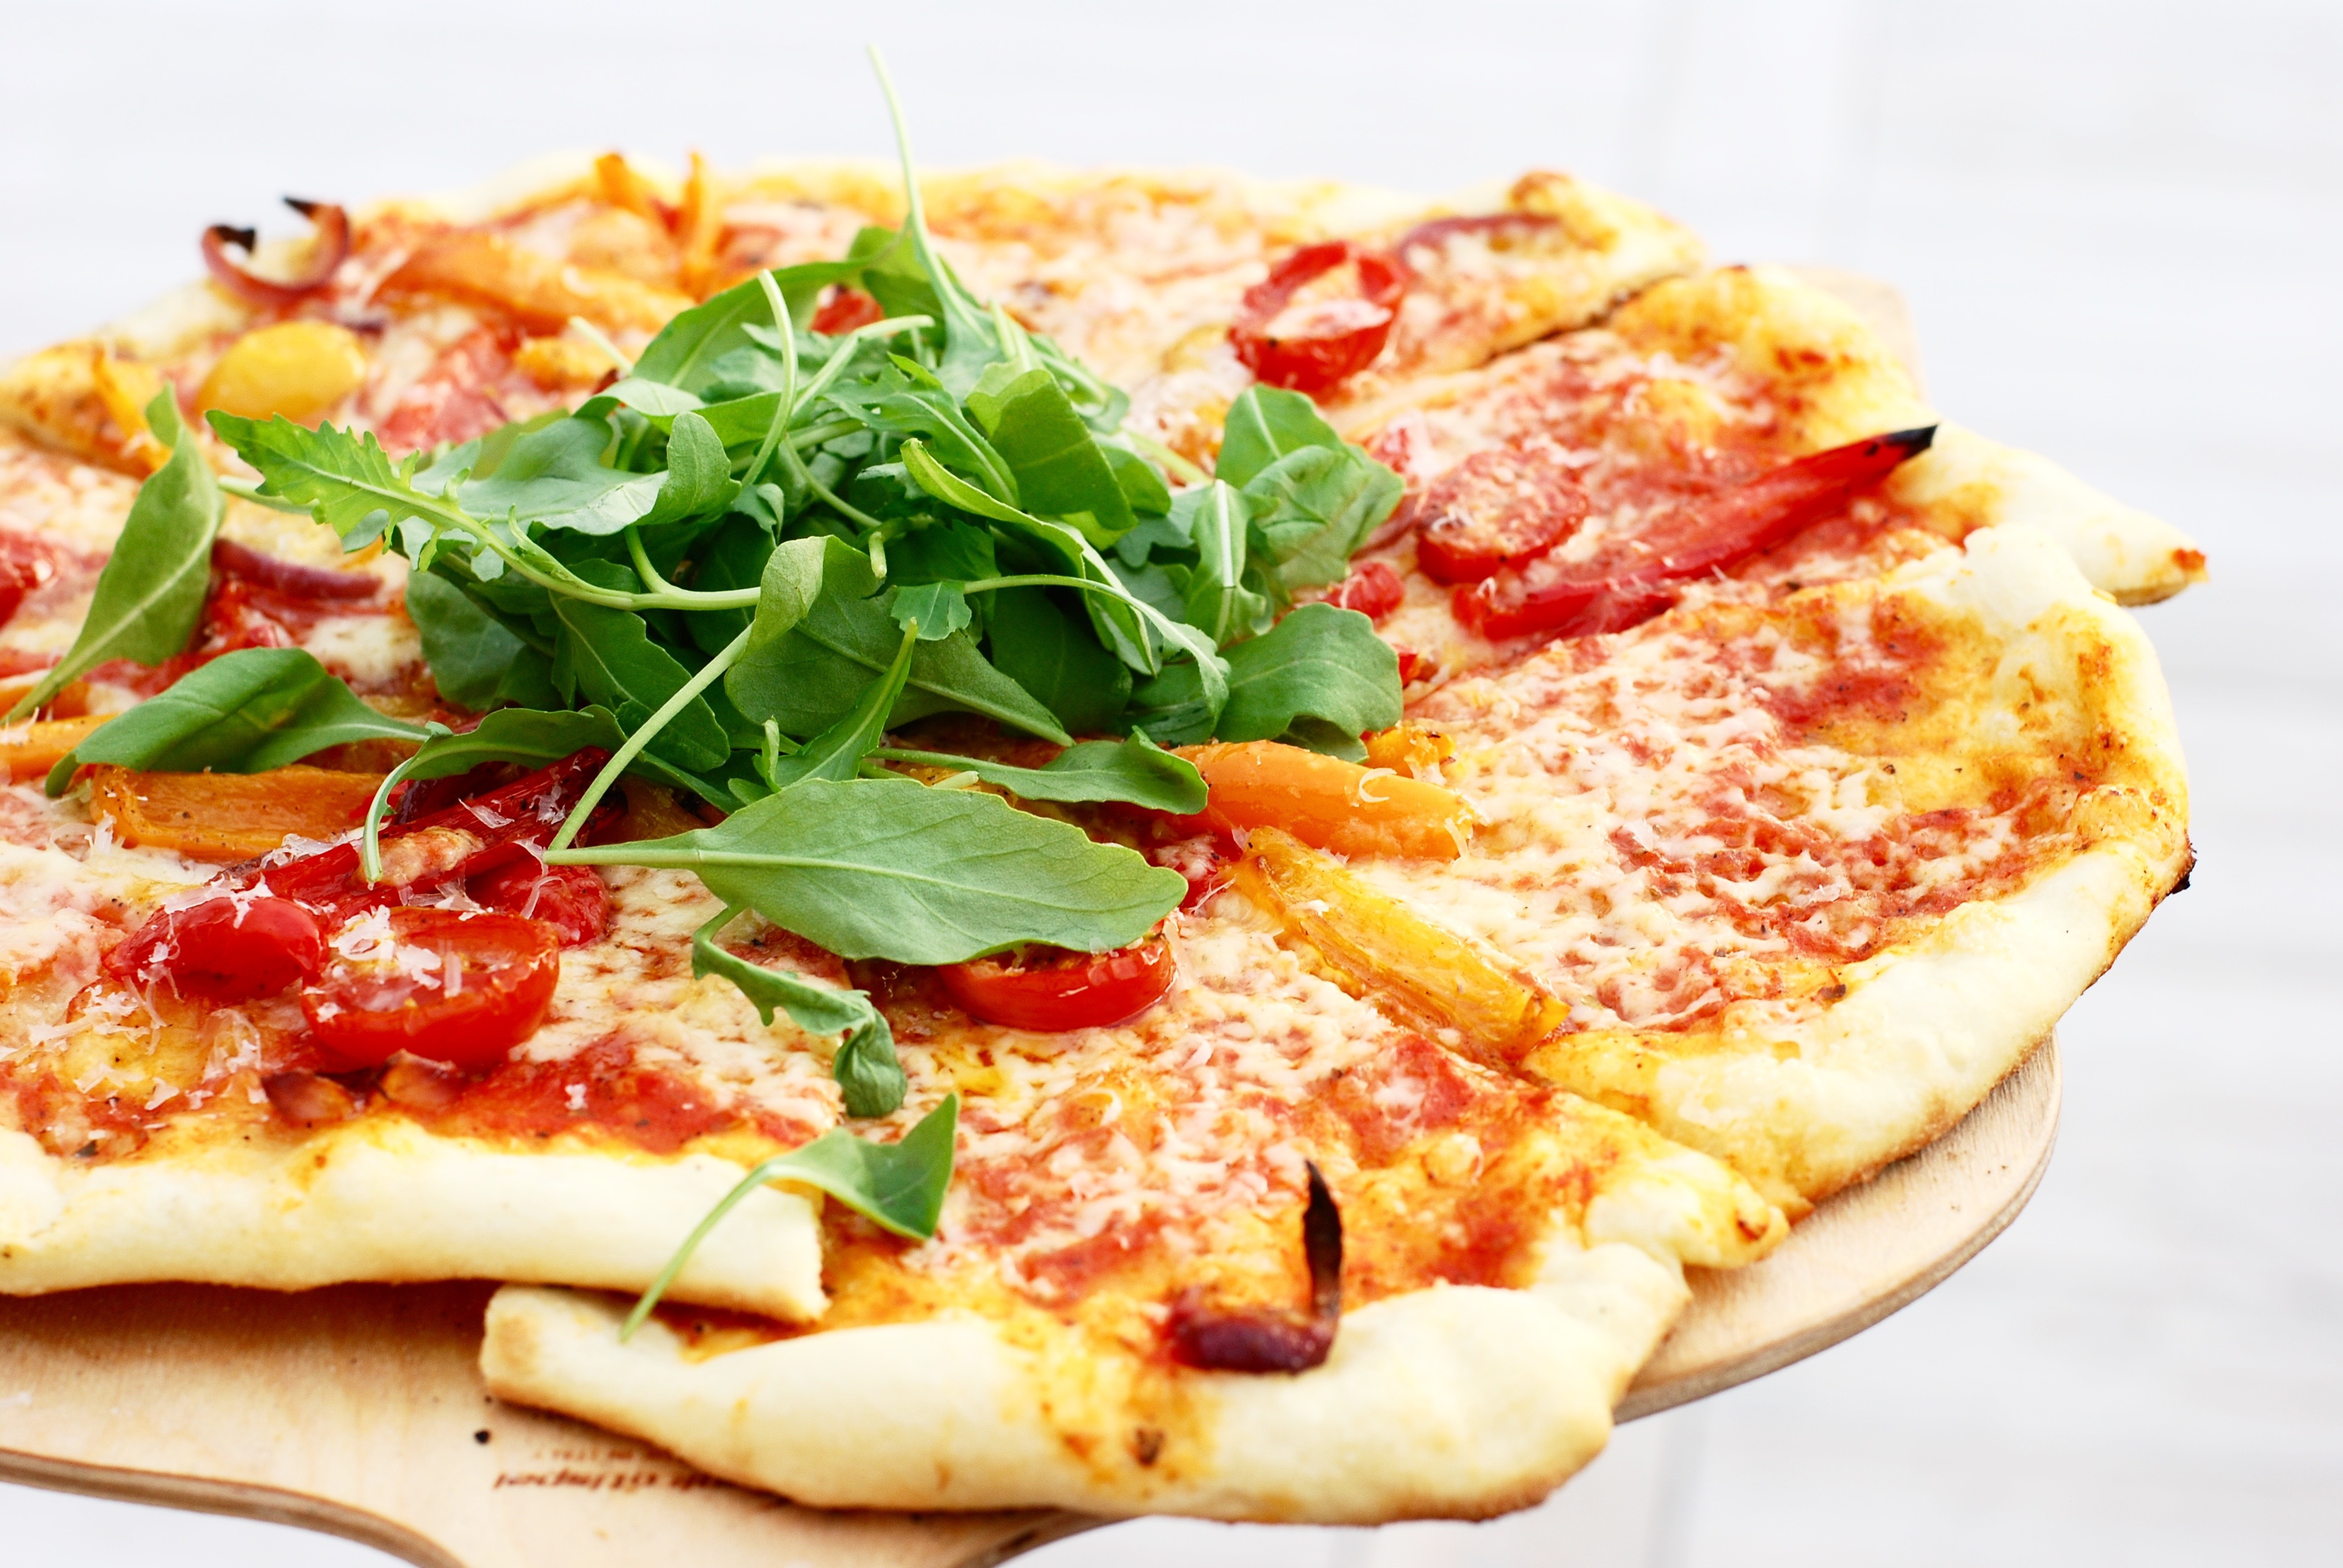 godaste pizza pålägg